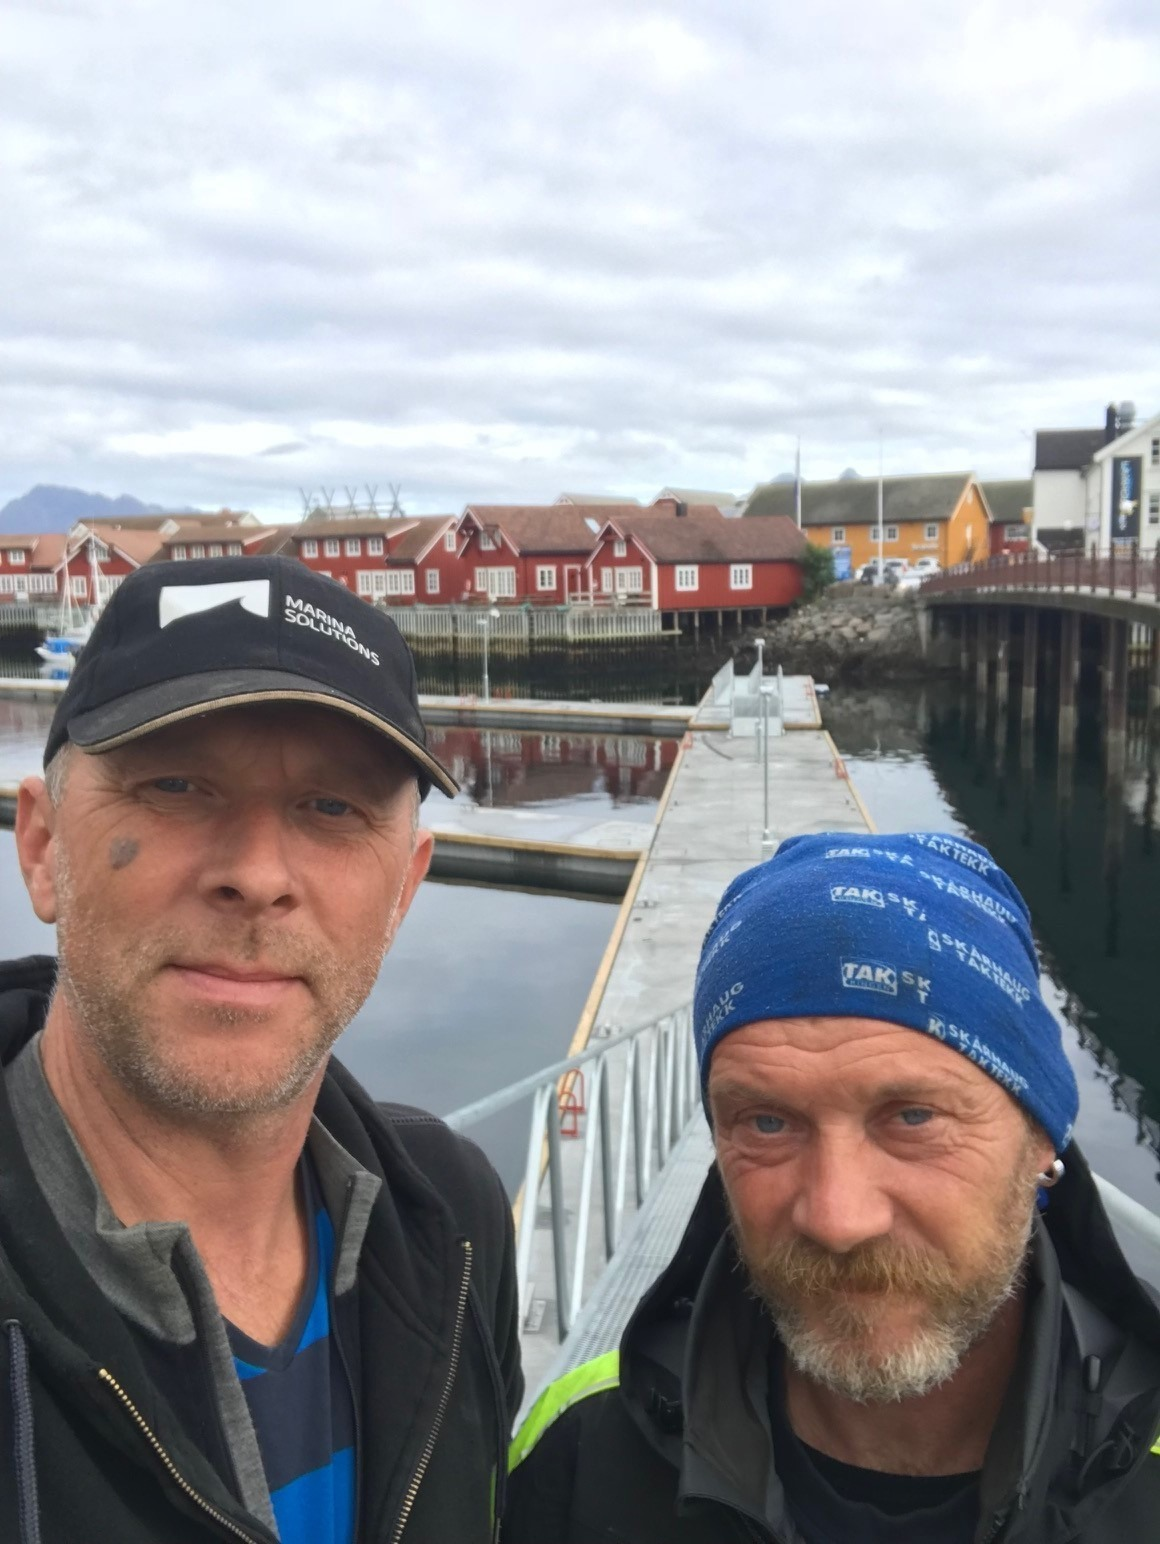 https://marinasolutions.no/uploads/Svolvær-Marina-solutions-flytebrygger-Leif-Petter-Vartdal-Erling-Berge-montører-2.jpg